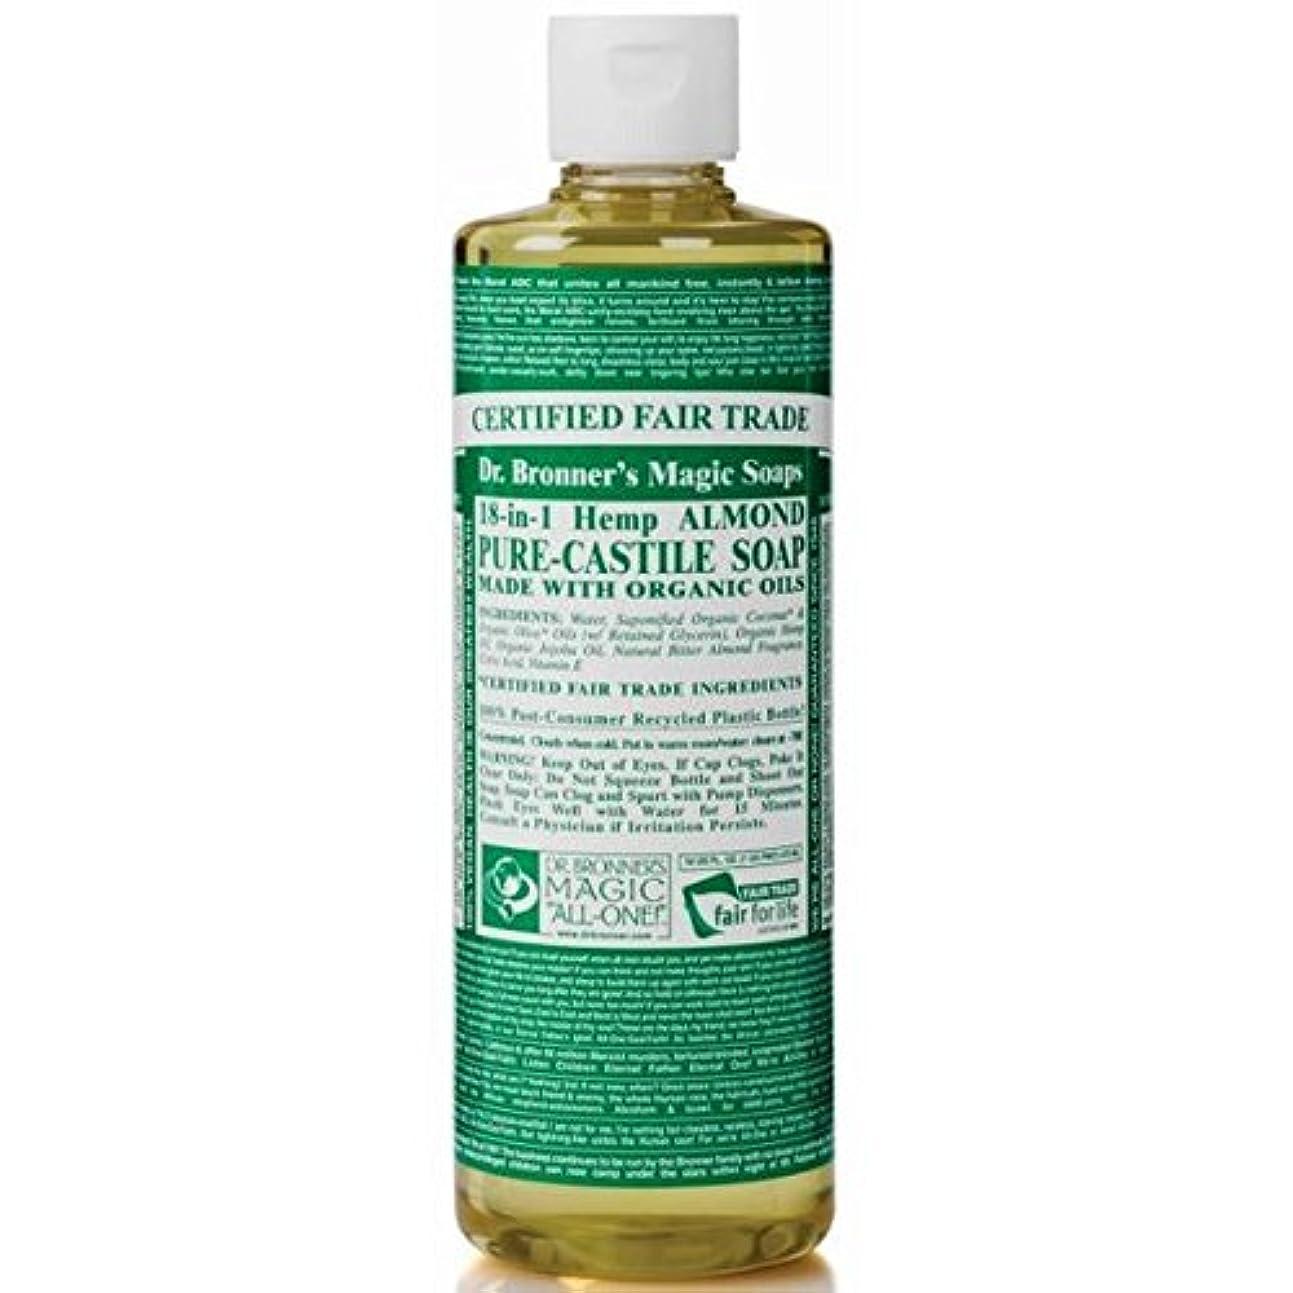 Dr Bronner Organic Almond Castile Liquid Soap 237ml (Pack of 6) - のブロナー有機アーモンドカスティーリャ液体石鹸237ミリリットル x6 [並行輸入品]